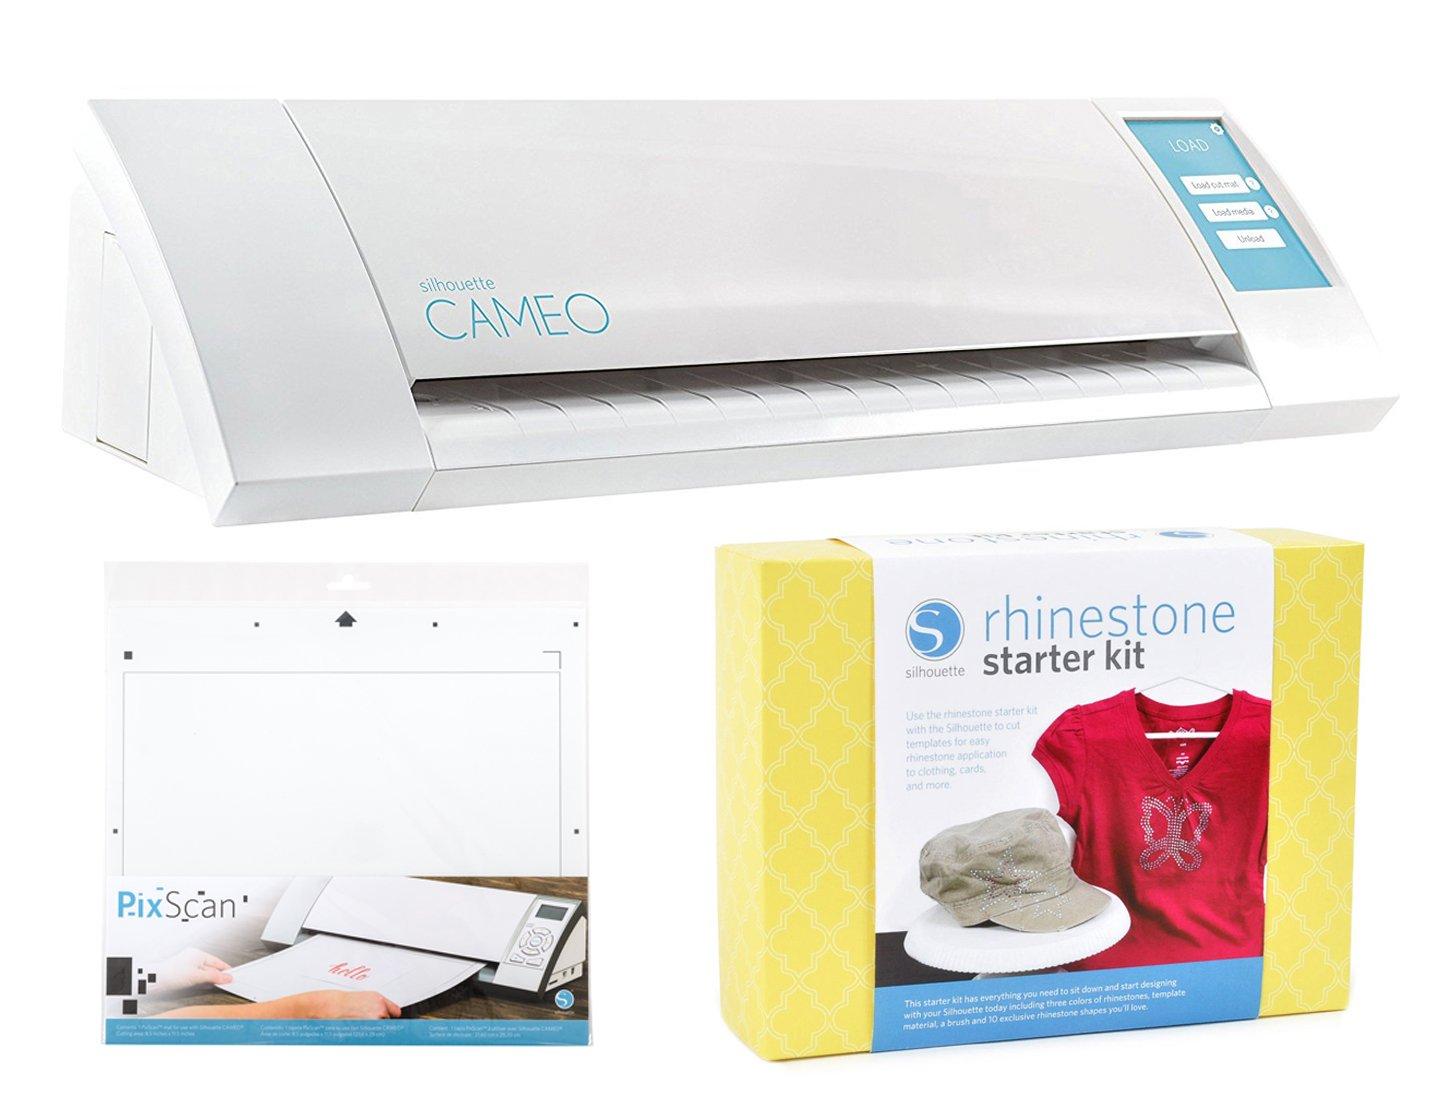 Silhouette Cameo Rhinestone Starter Kit Bundle with Pixscan Cutting Mat